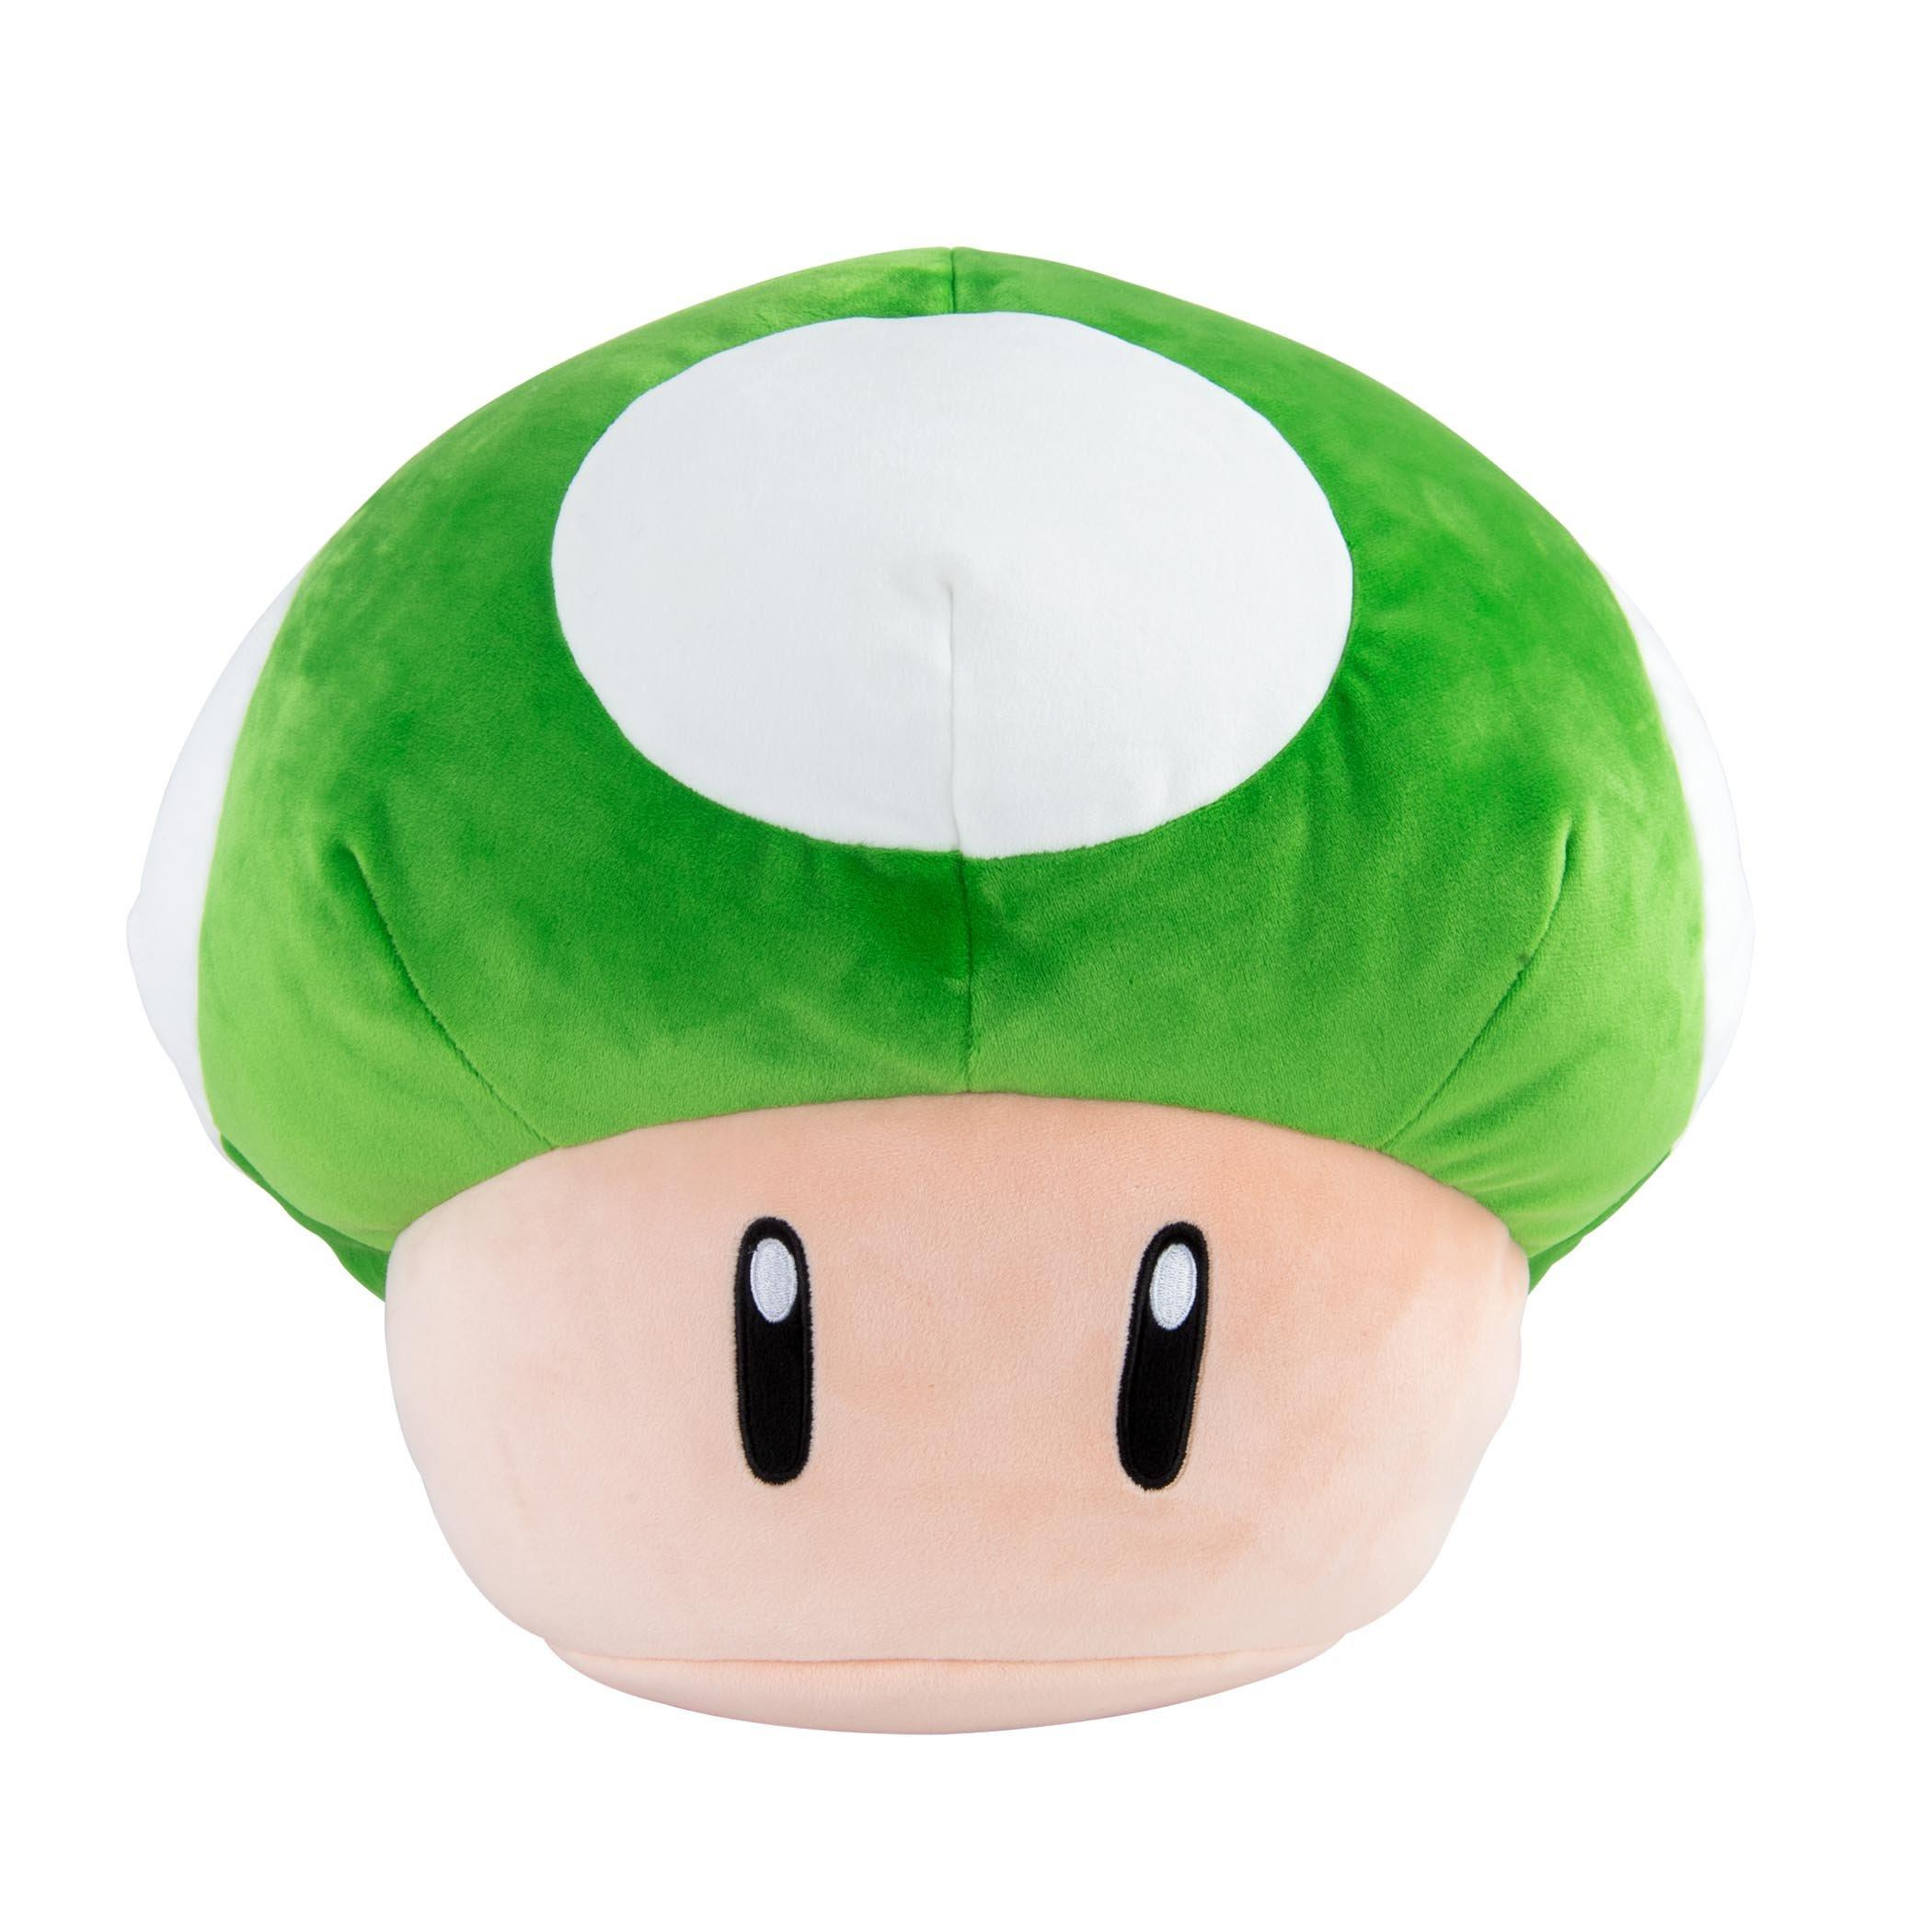 Mario Kart Green Mushroom Plush Gamestop